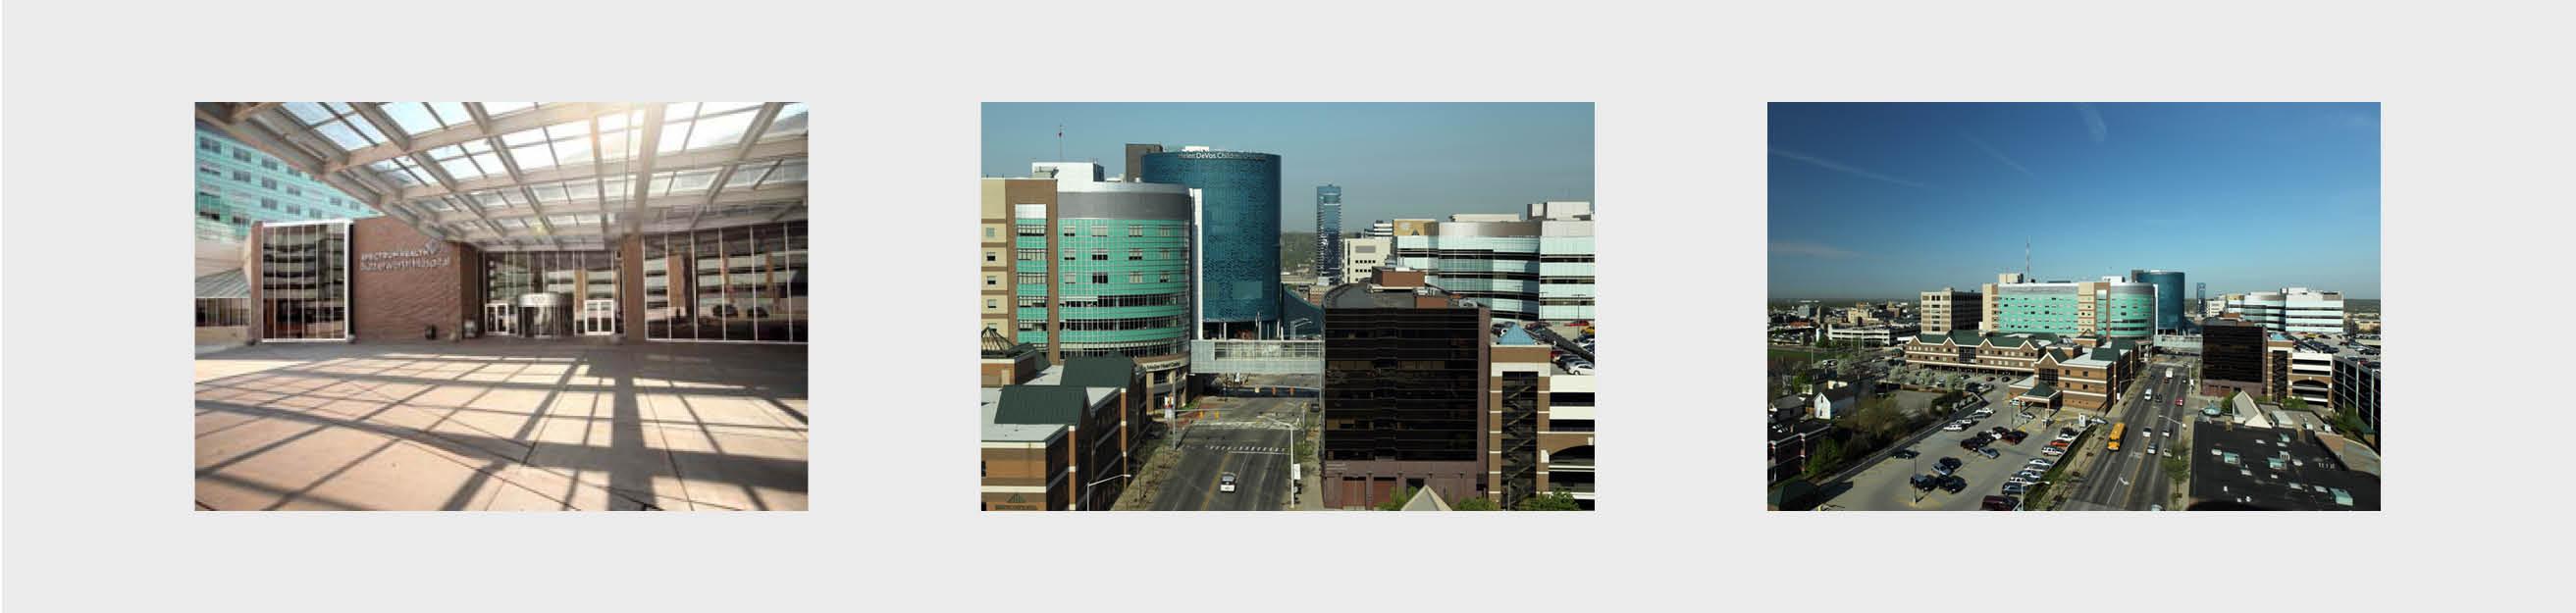 Spectrum-Health-Butterworth-Hospital